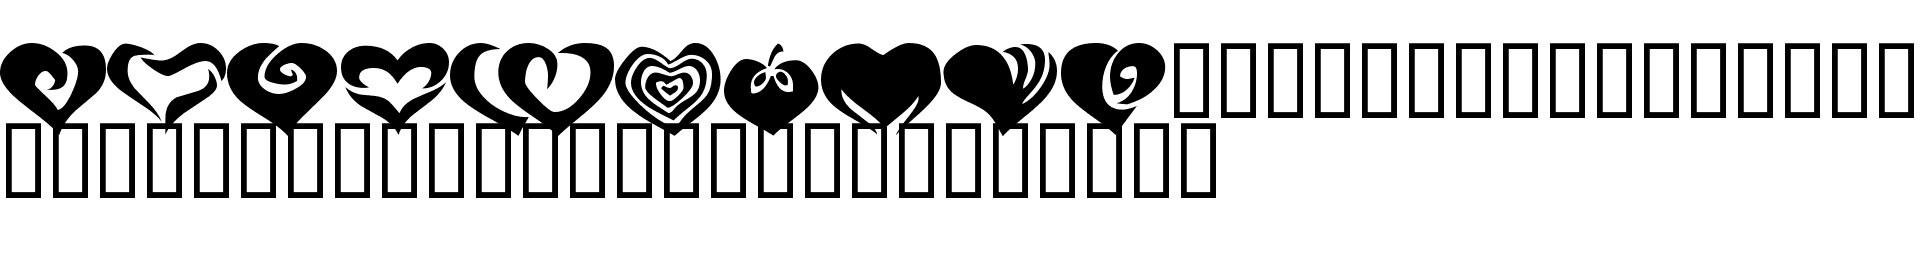 KR Valentines 2006 Two